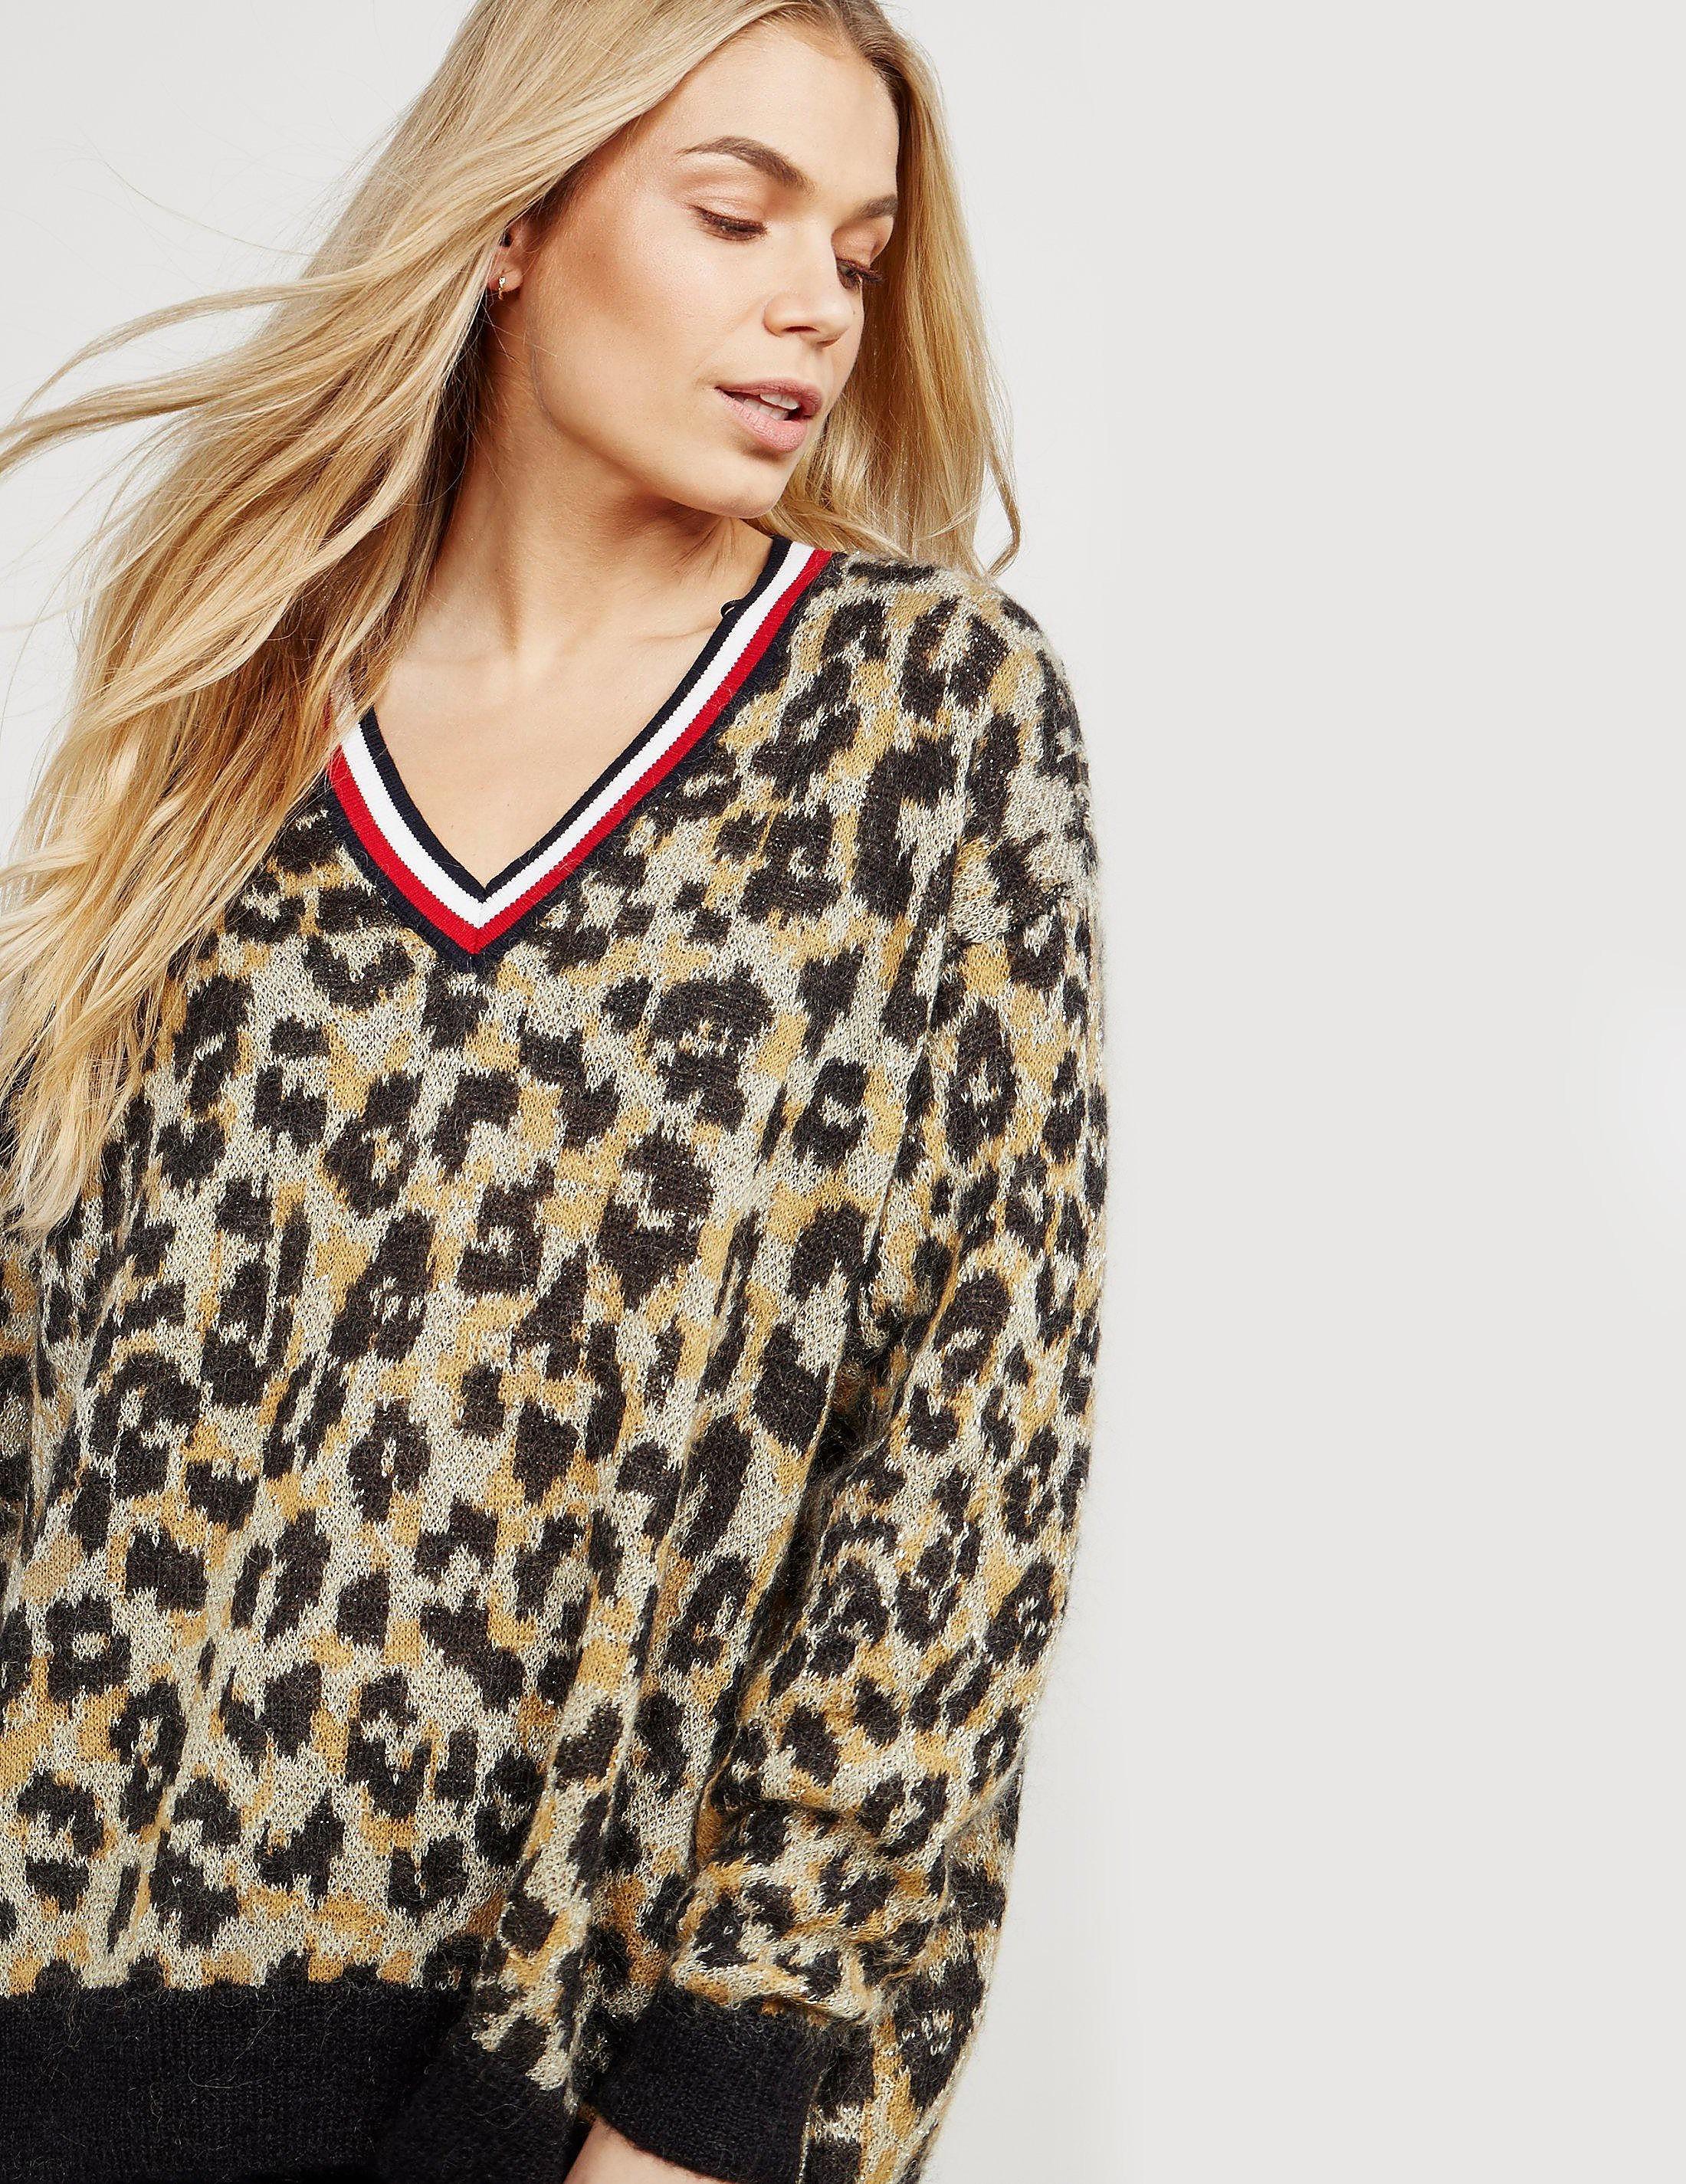 Tommy Hilfiger Akina Leopard Knit Jumper